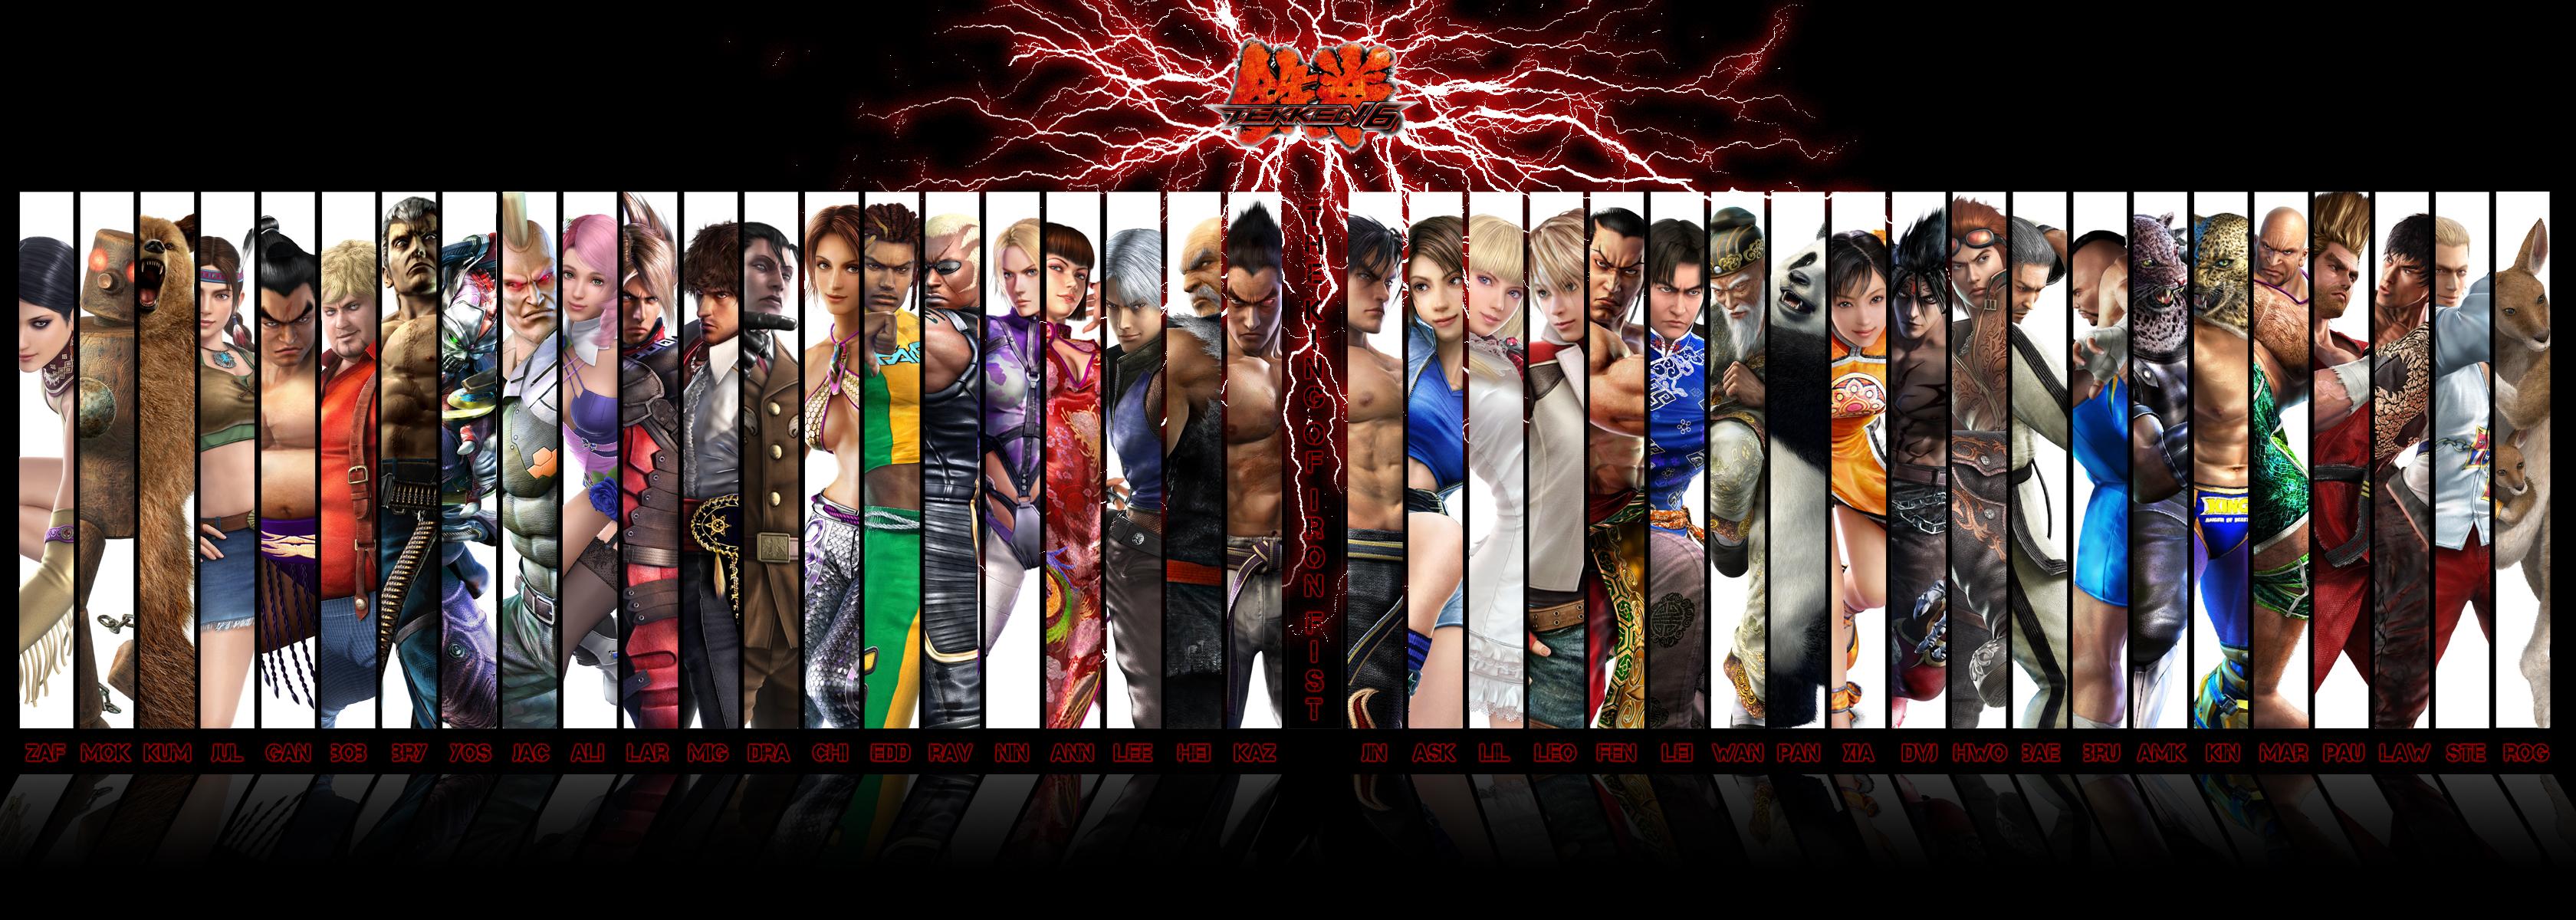 Tekken 6 Wallpaper by the4got10one 3360x1200